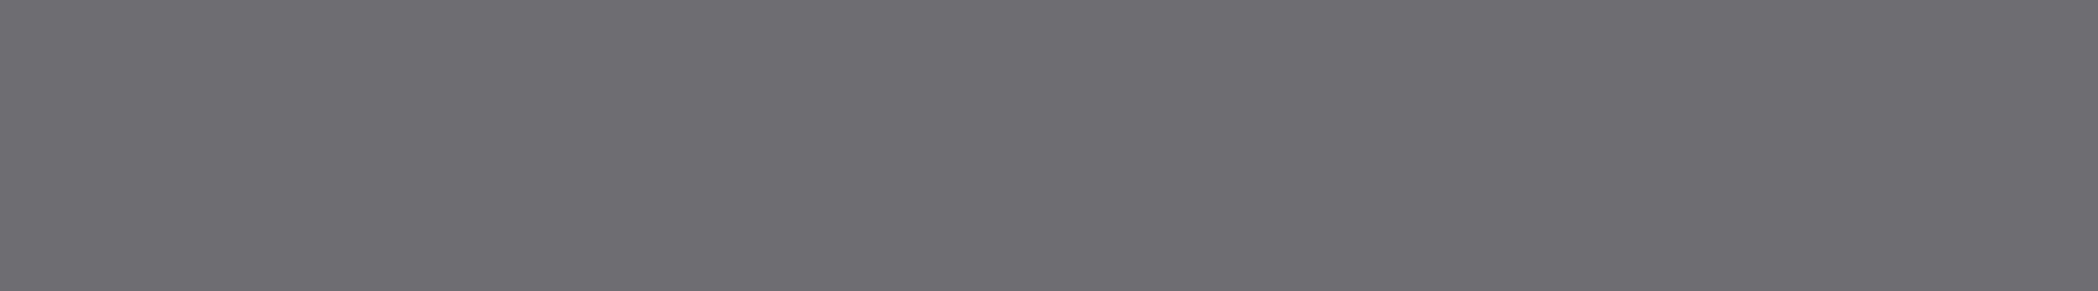 COSTARTERS_logo-gray_logo-mark